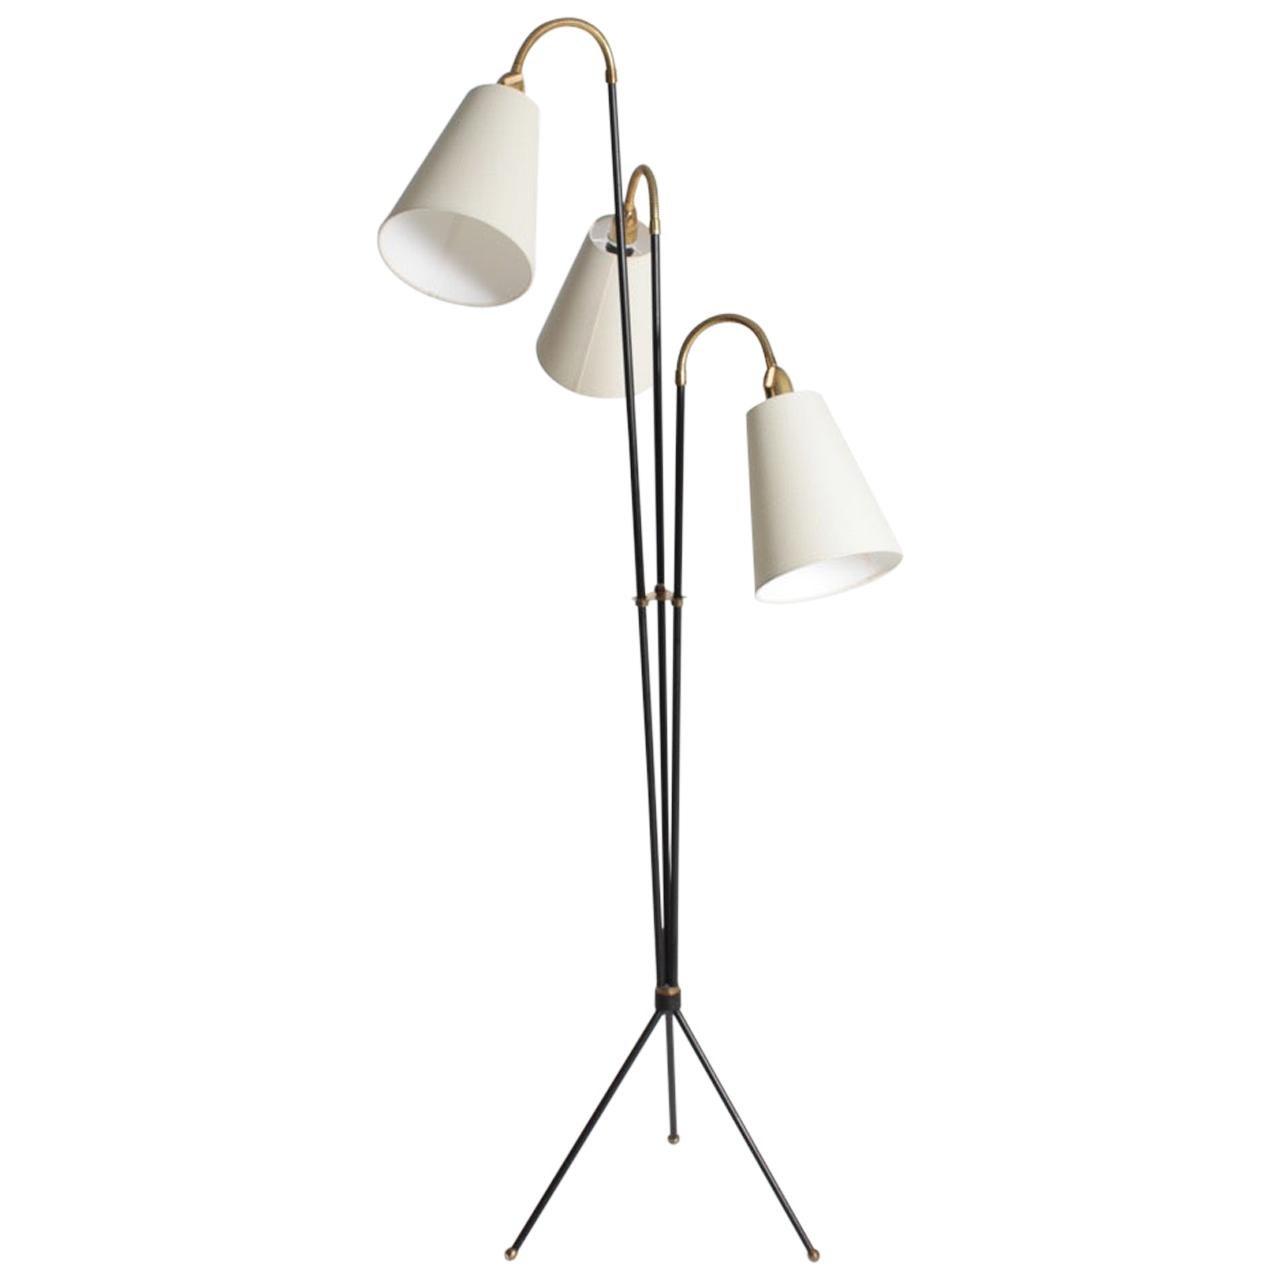 Elegant Danish Midcentury Floor Lamp by Holm Sorensen, 1950s